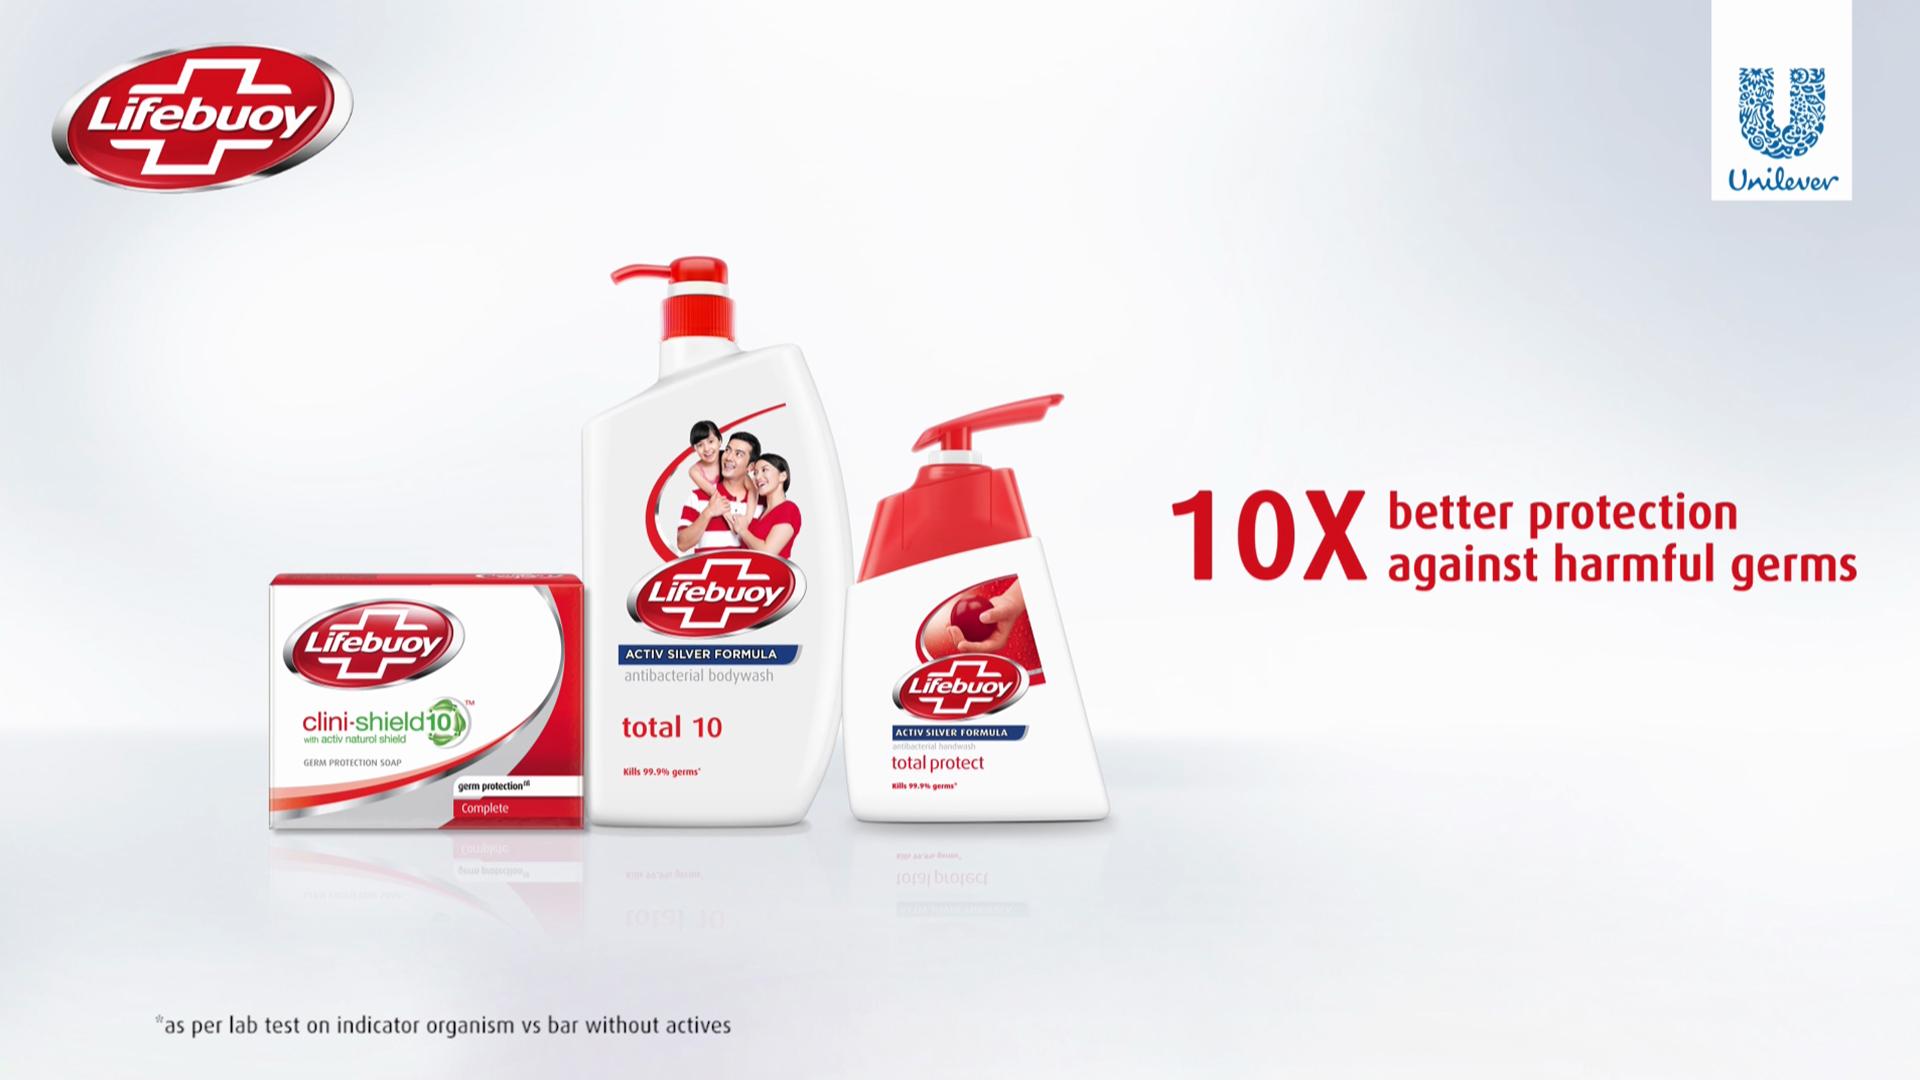 Unilever – Lifebuoy Singapur